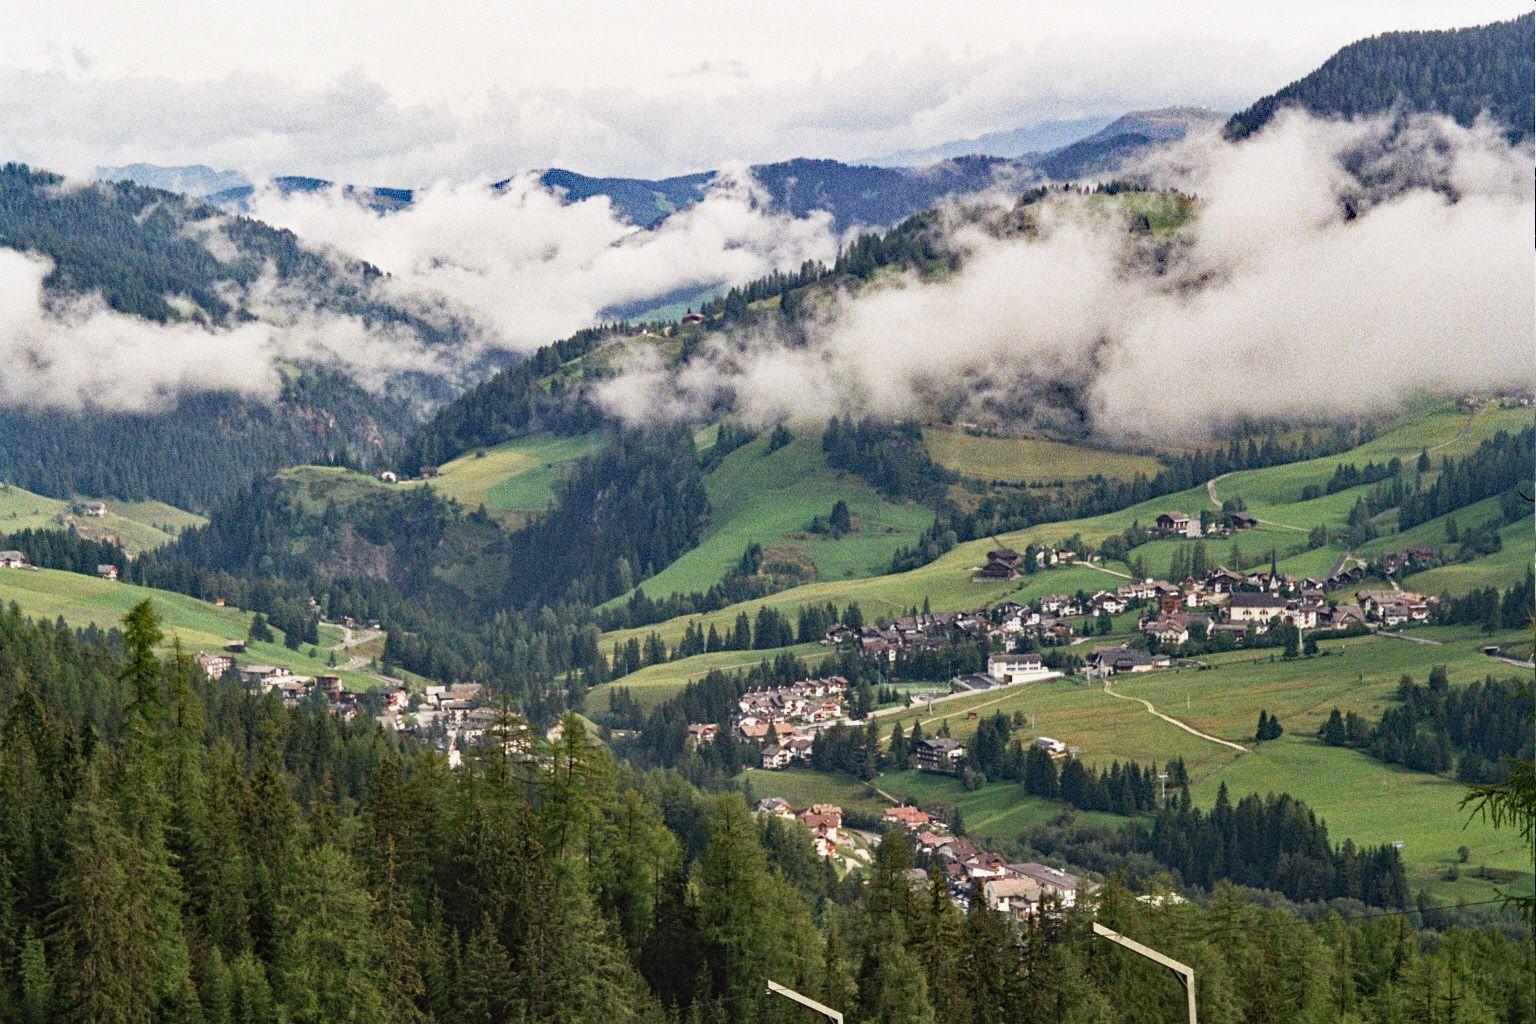 Comune Di Lana Bz badia, south tyrol - wikipedia